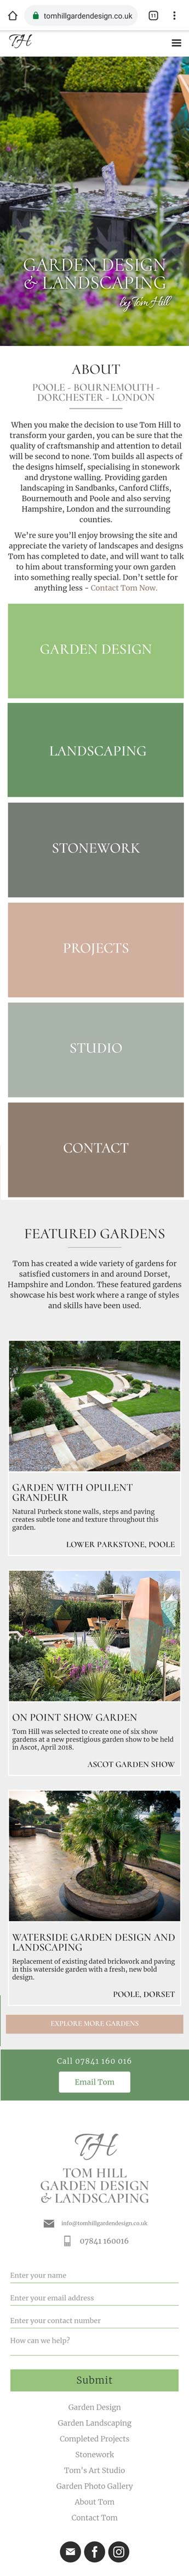 Gardener website design mobile screen shot image